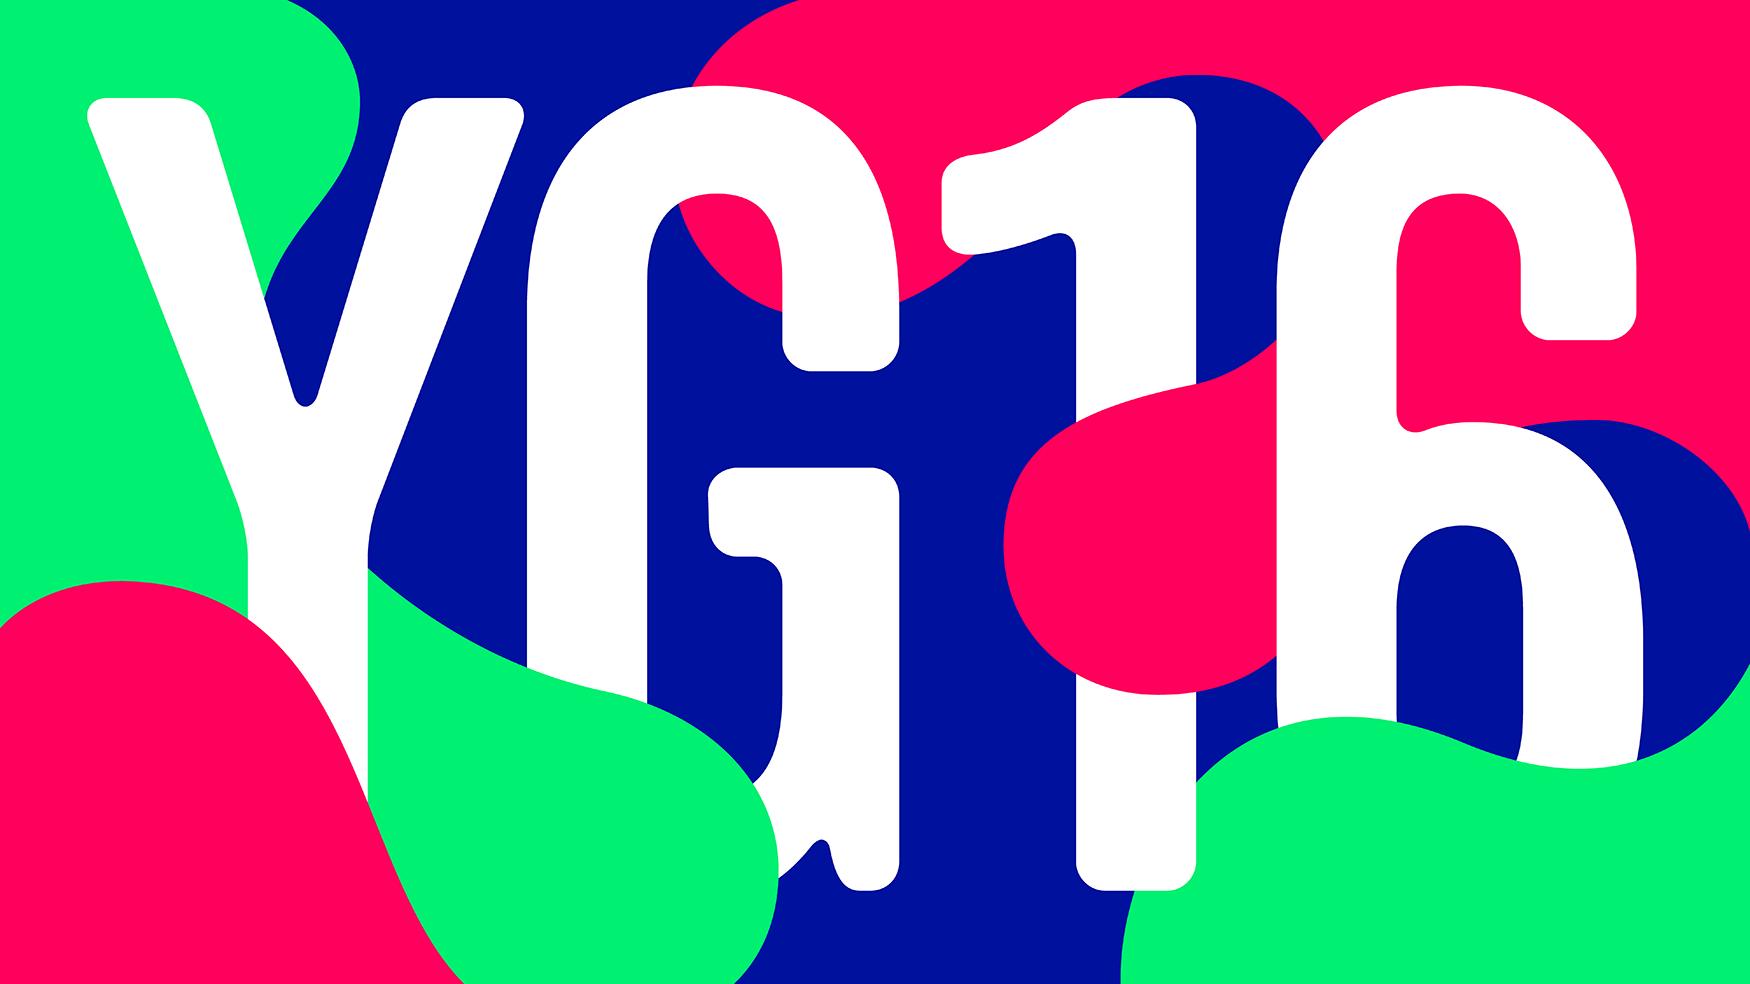 1920x1080-01